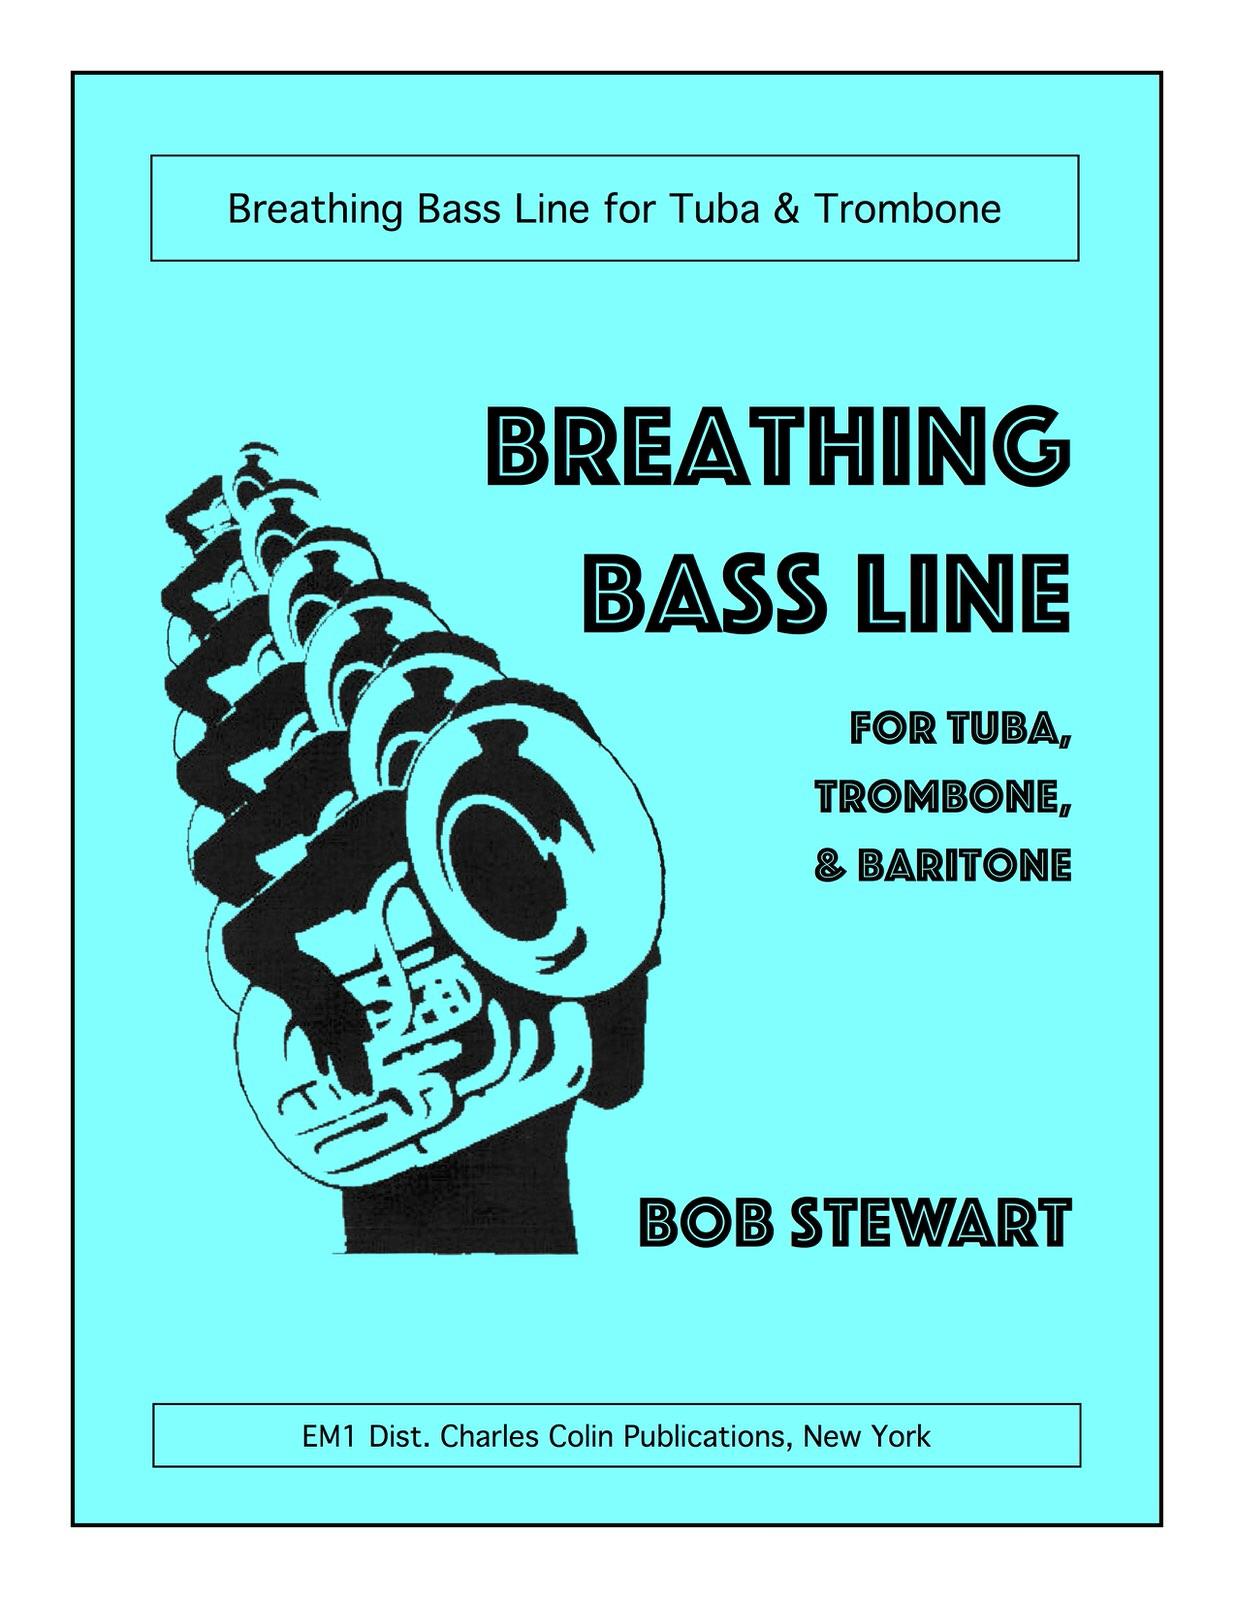 Stewart, Bob, The Breathing Bass Line-p01